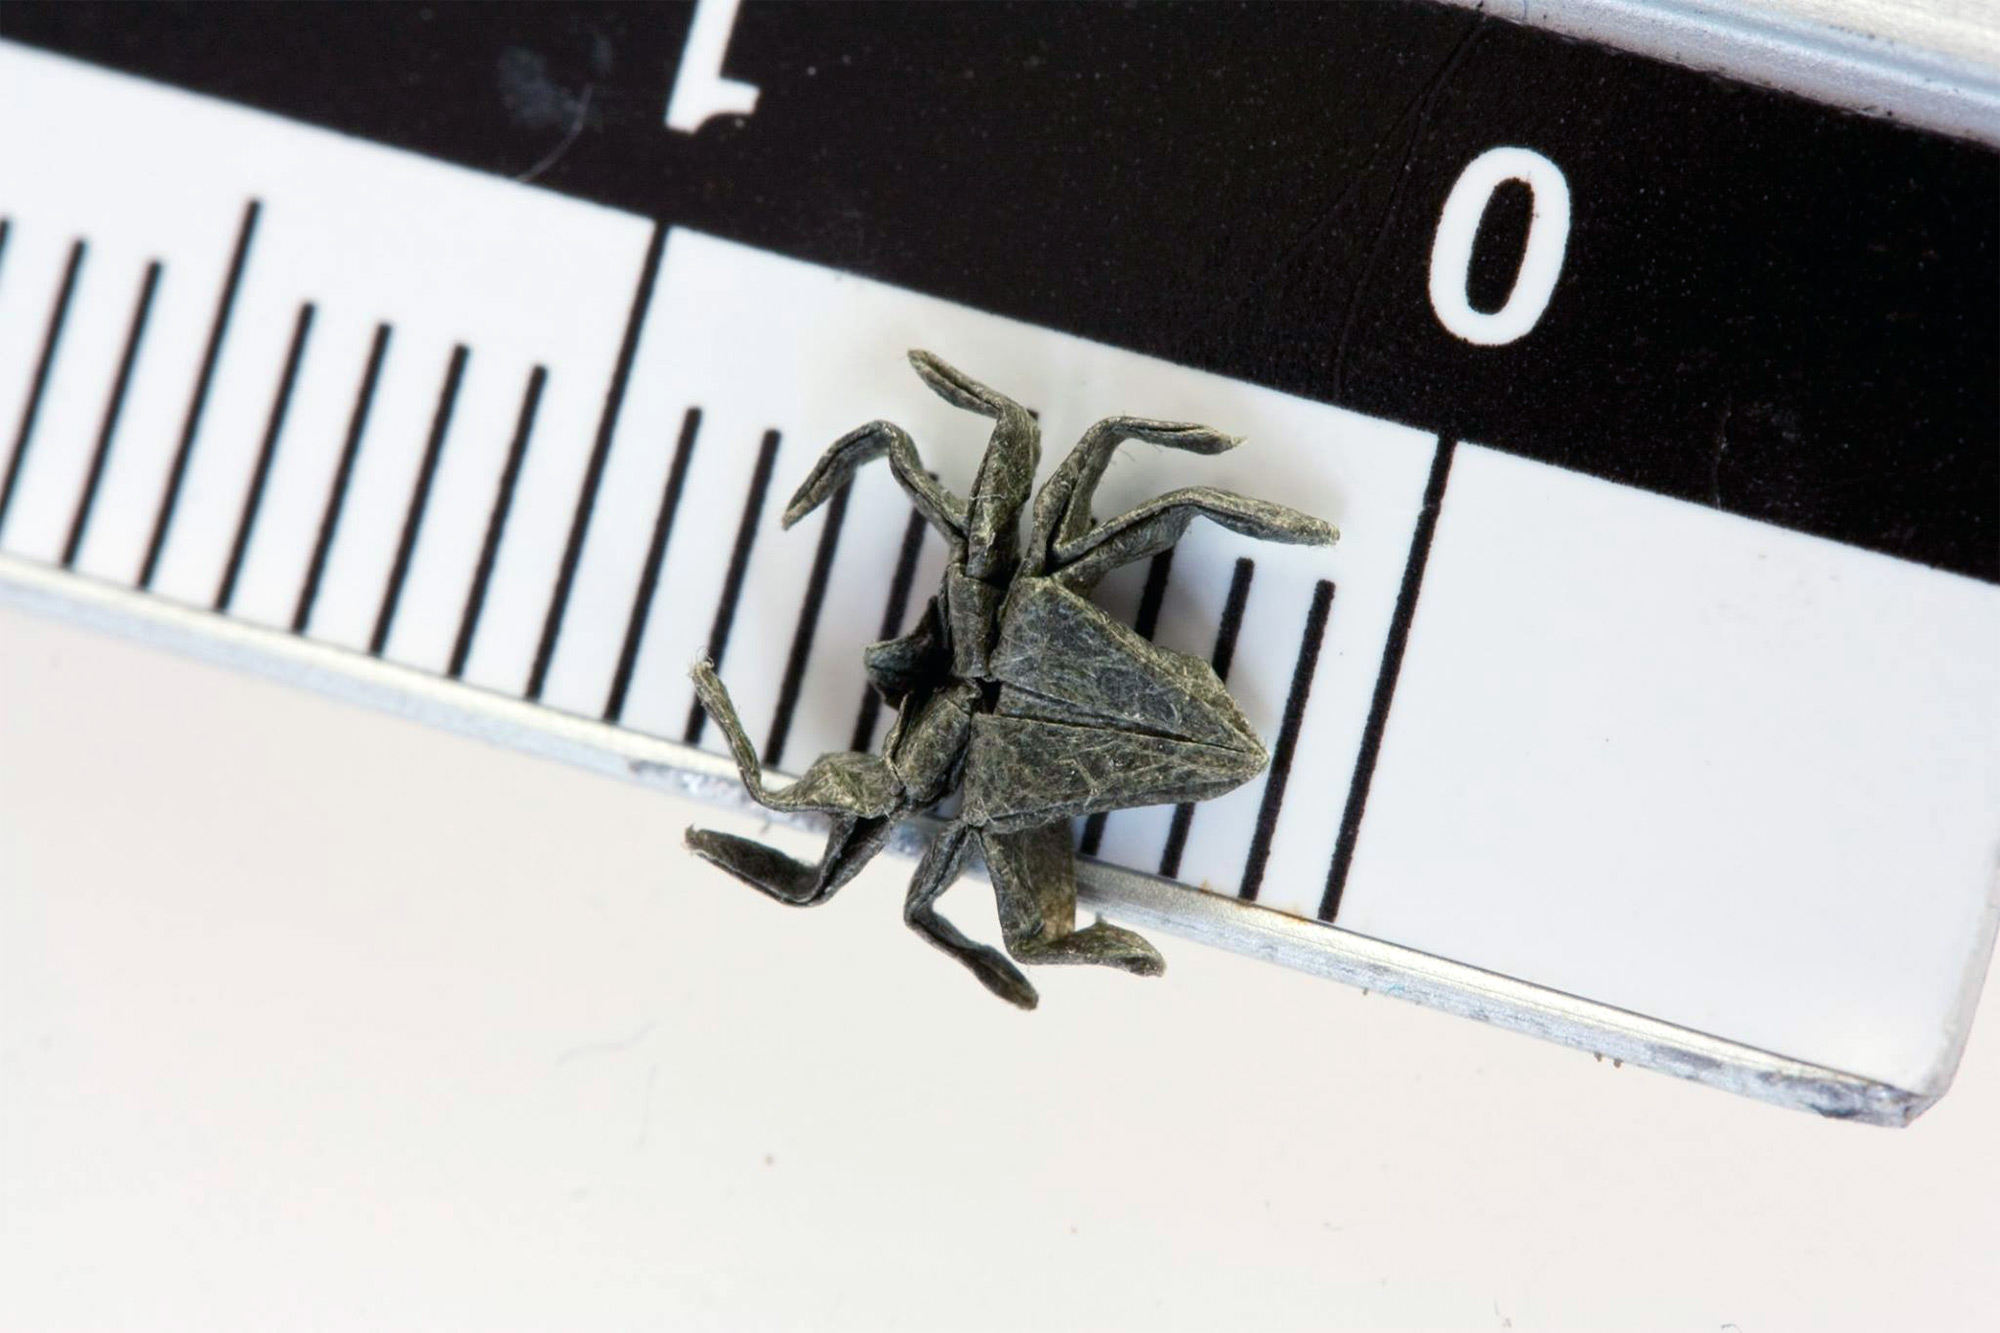 Nano Origami: Infinitesimal Folded Paper Creations by Anja Markiewicz